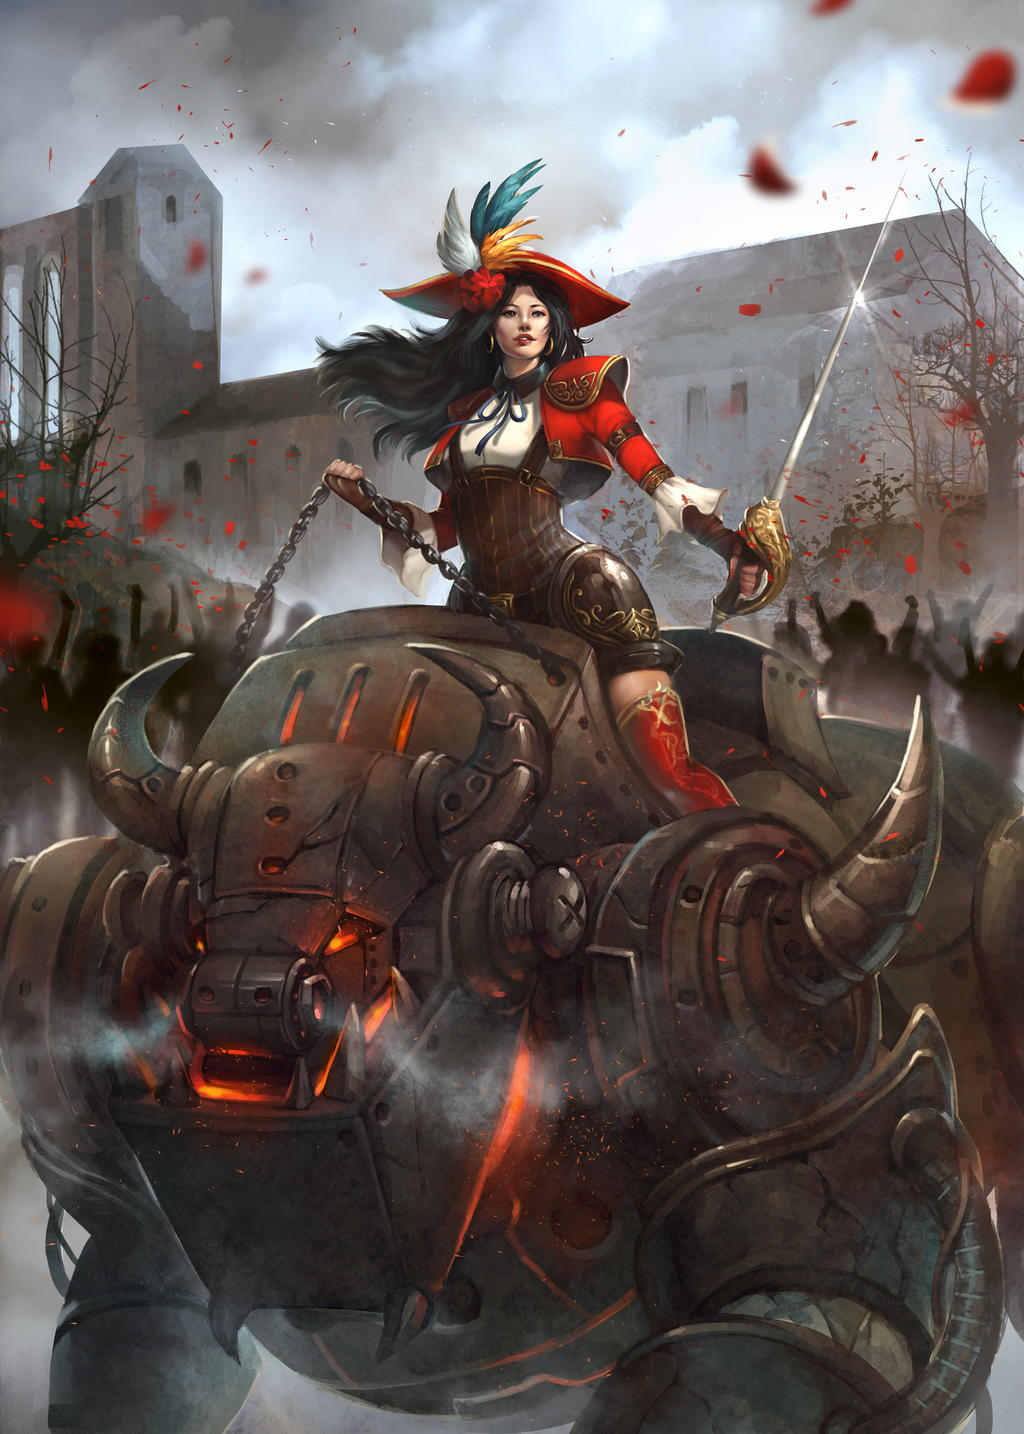 Steampunk Warrior Lady by AtelierRAN on DeviantArt